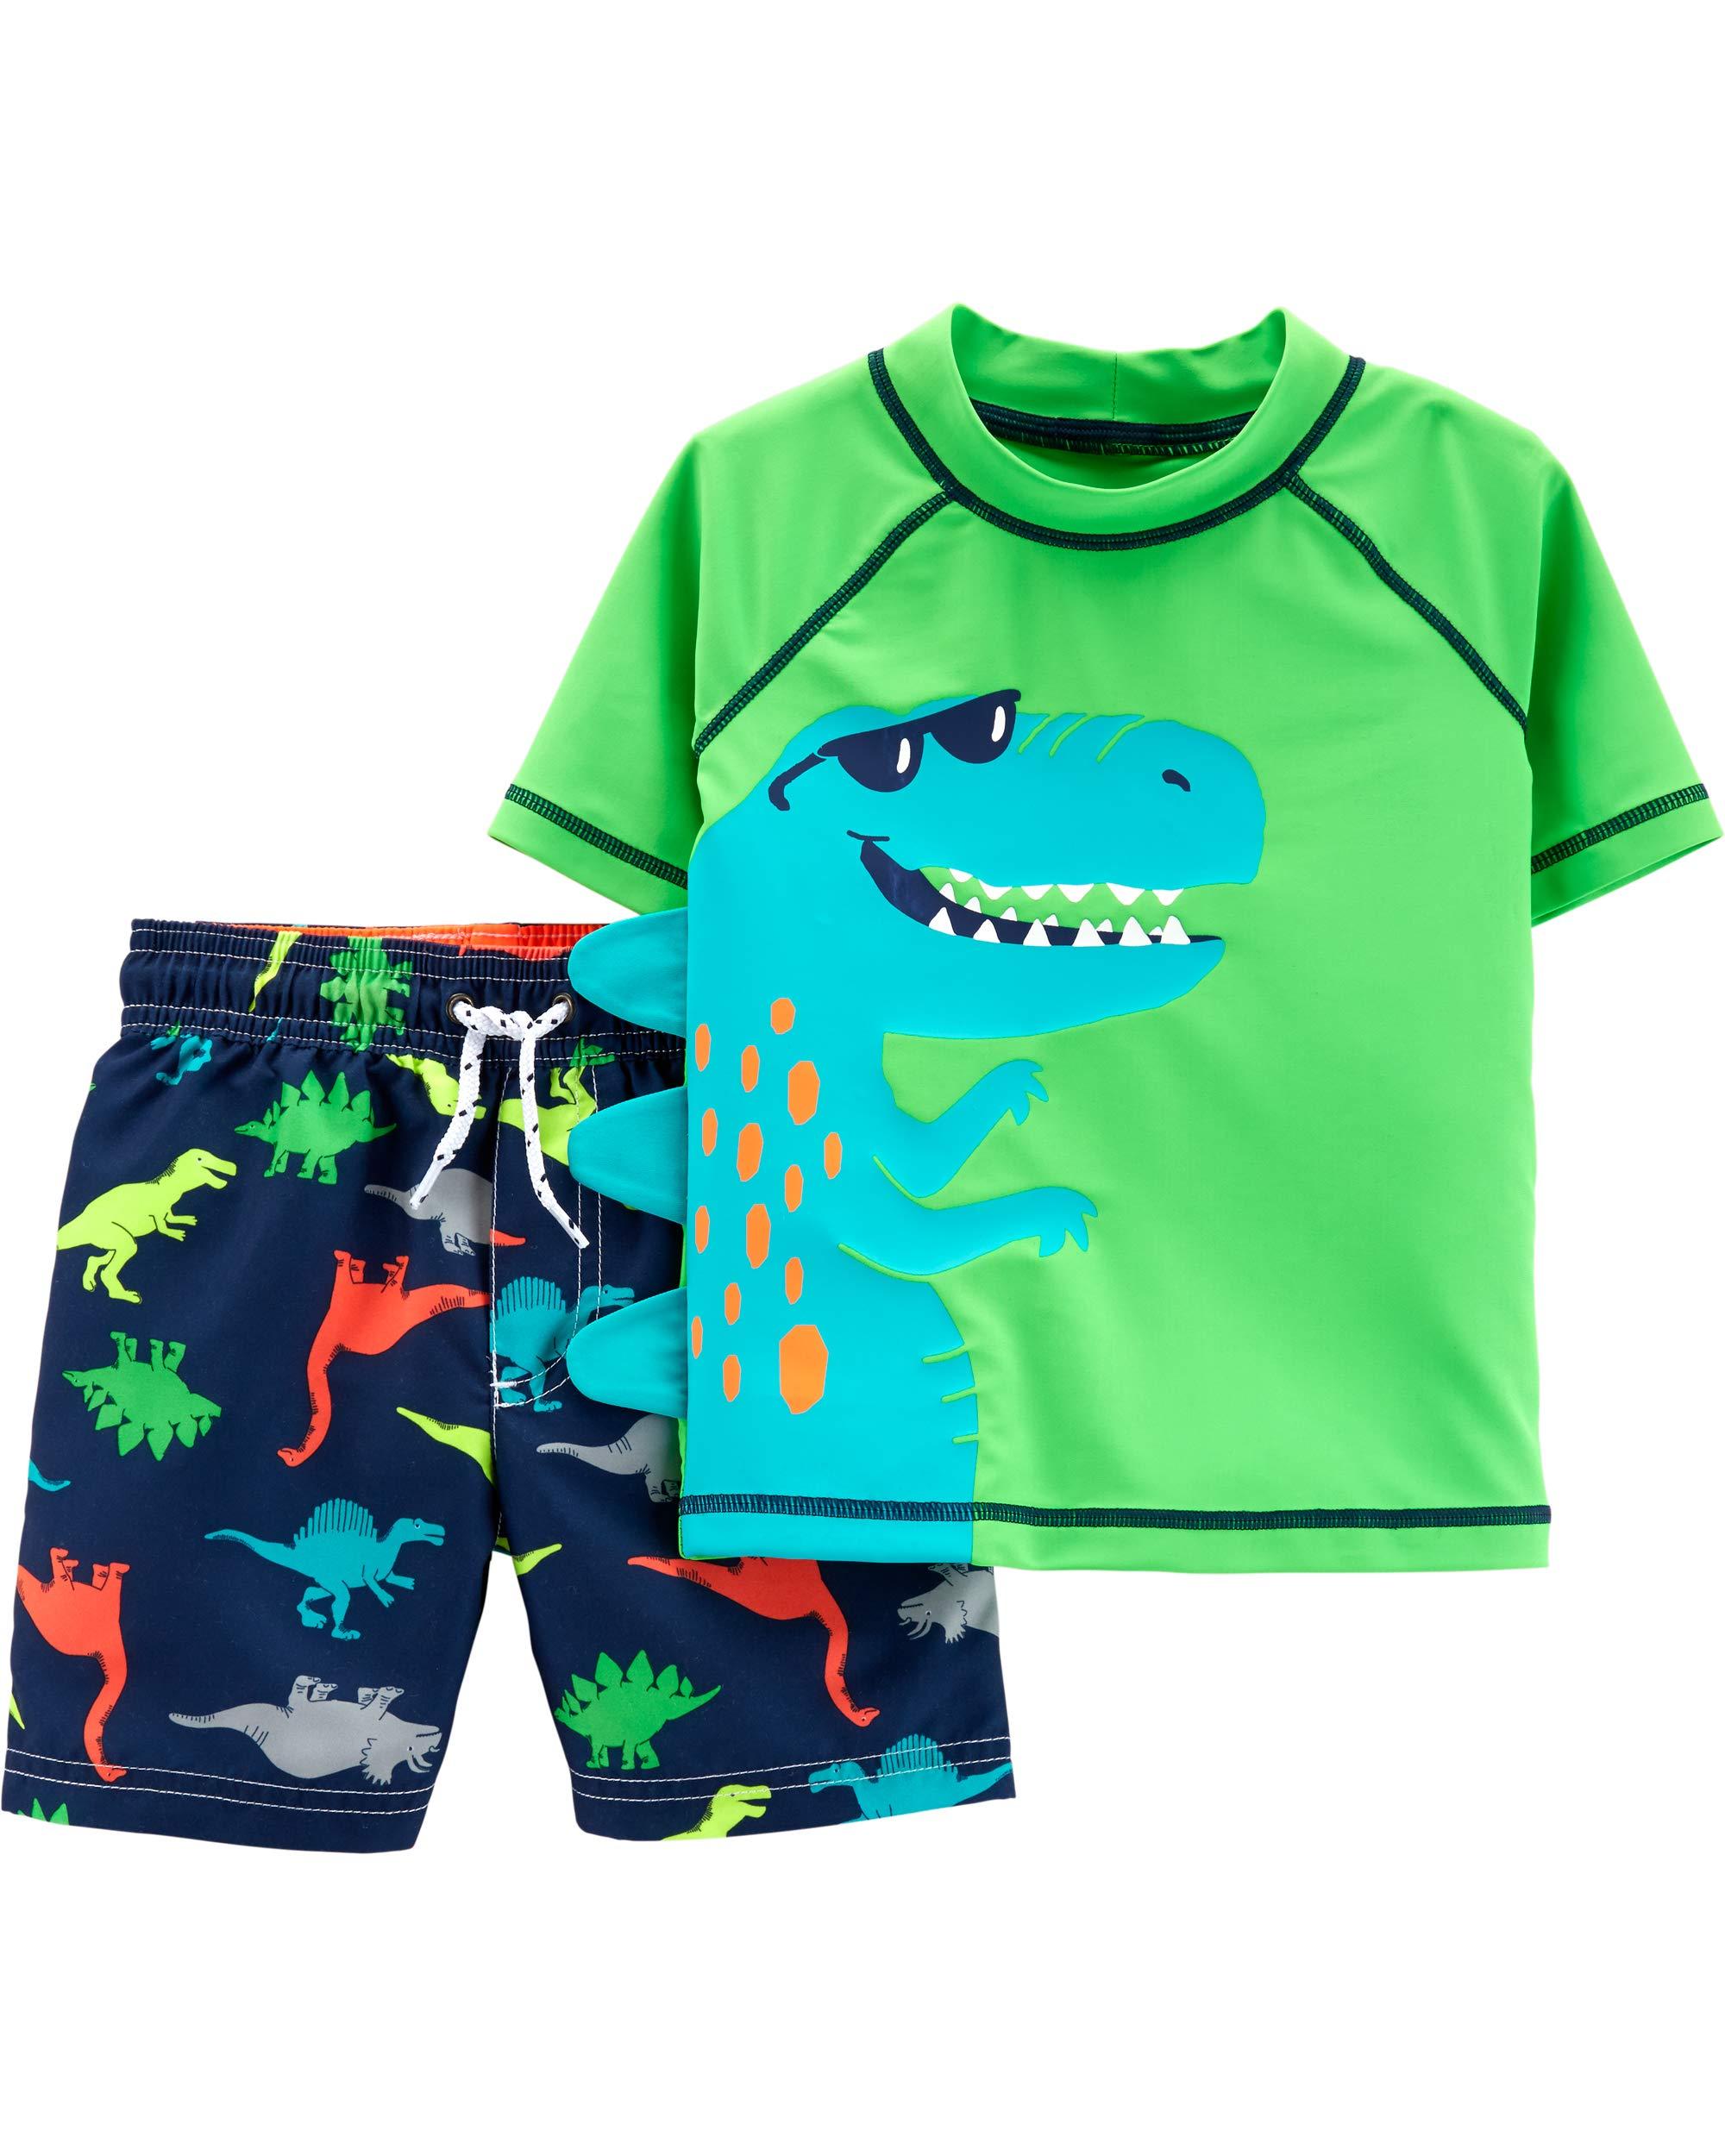 Carter's Toddler Boys' Rashguard Swim Set, Dinosaur, 3T